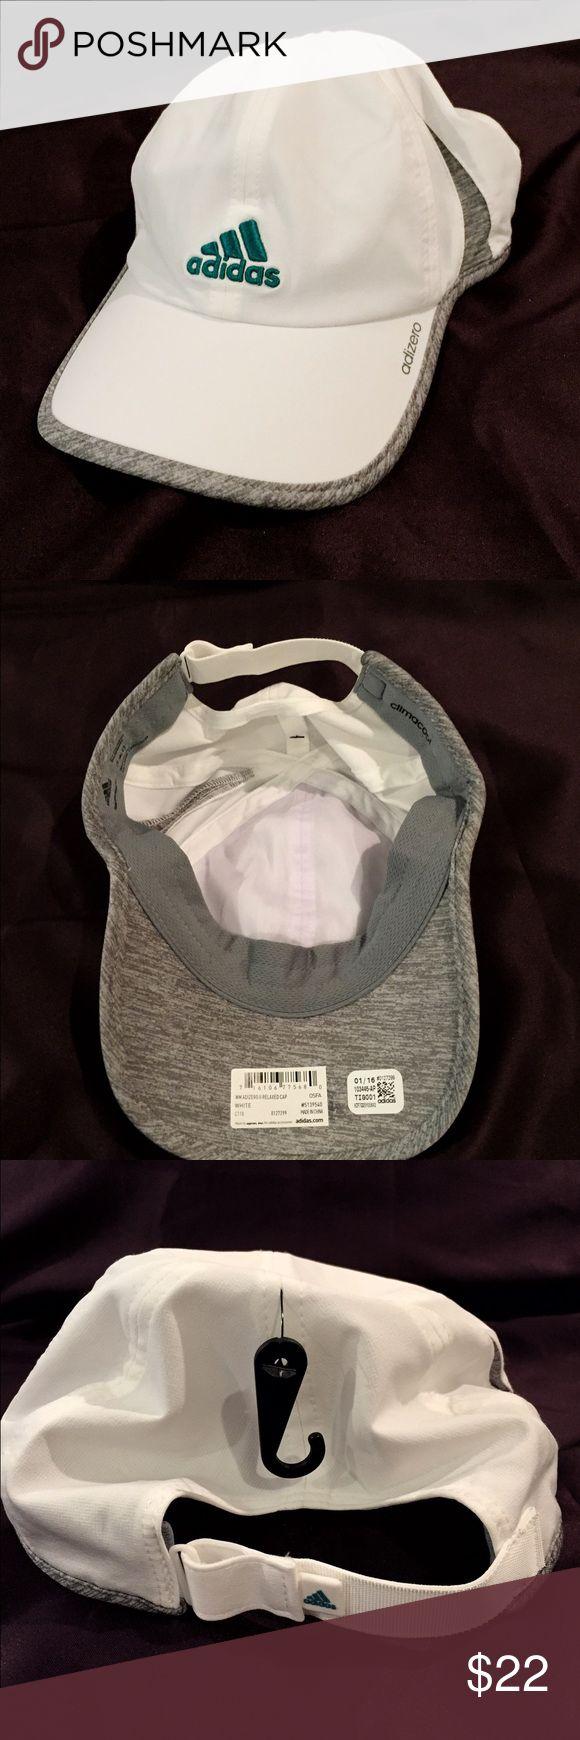 NEW Adidas women's white hat adizero II Adidas women's adizero II HAT. NEW WITH TAG. bought at adidas warehouse sale (no returns). Green (turquoise) adidas logo. Marbles gray trim. Super cute hat! NEVER WORN! Accessories Hats